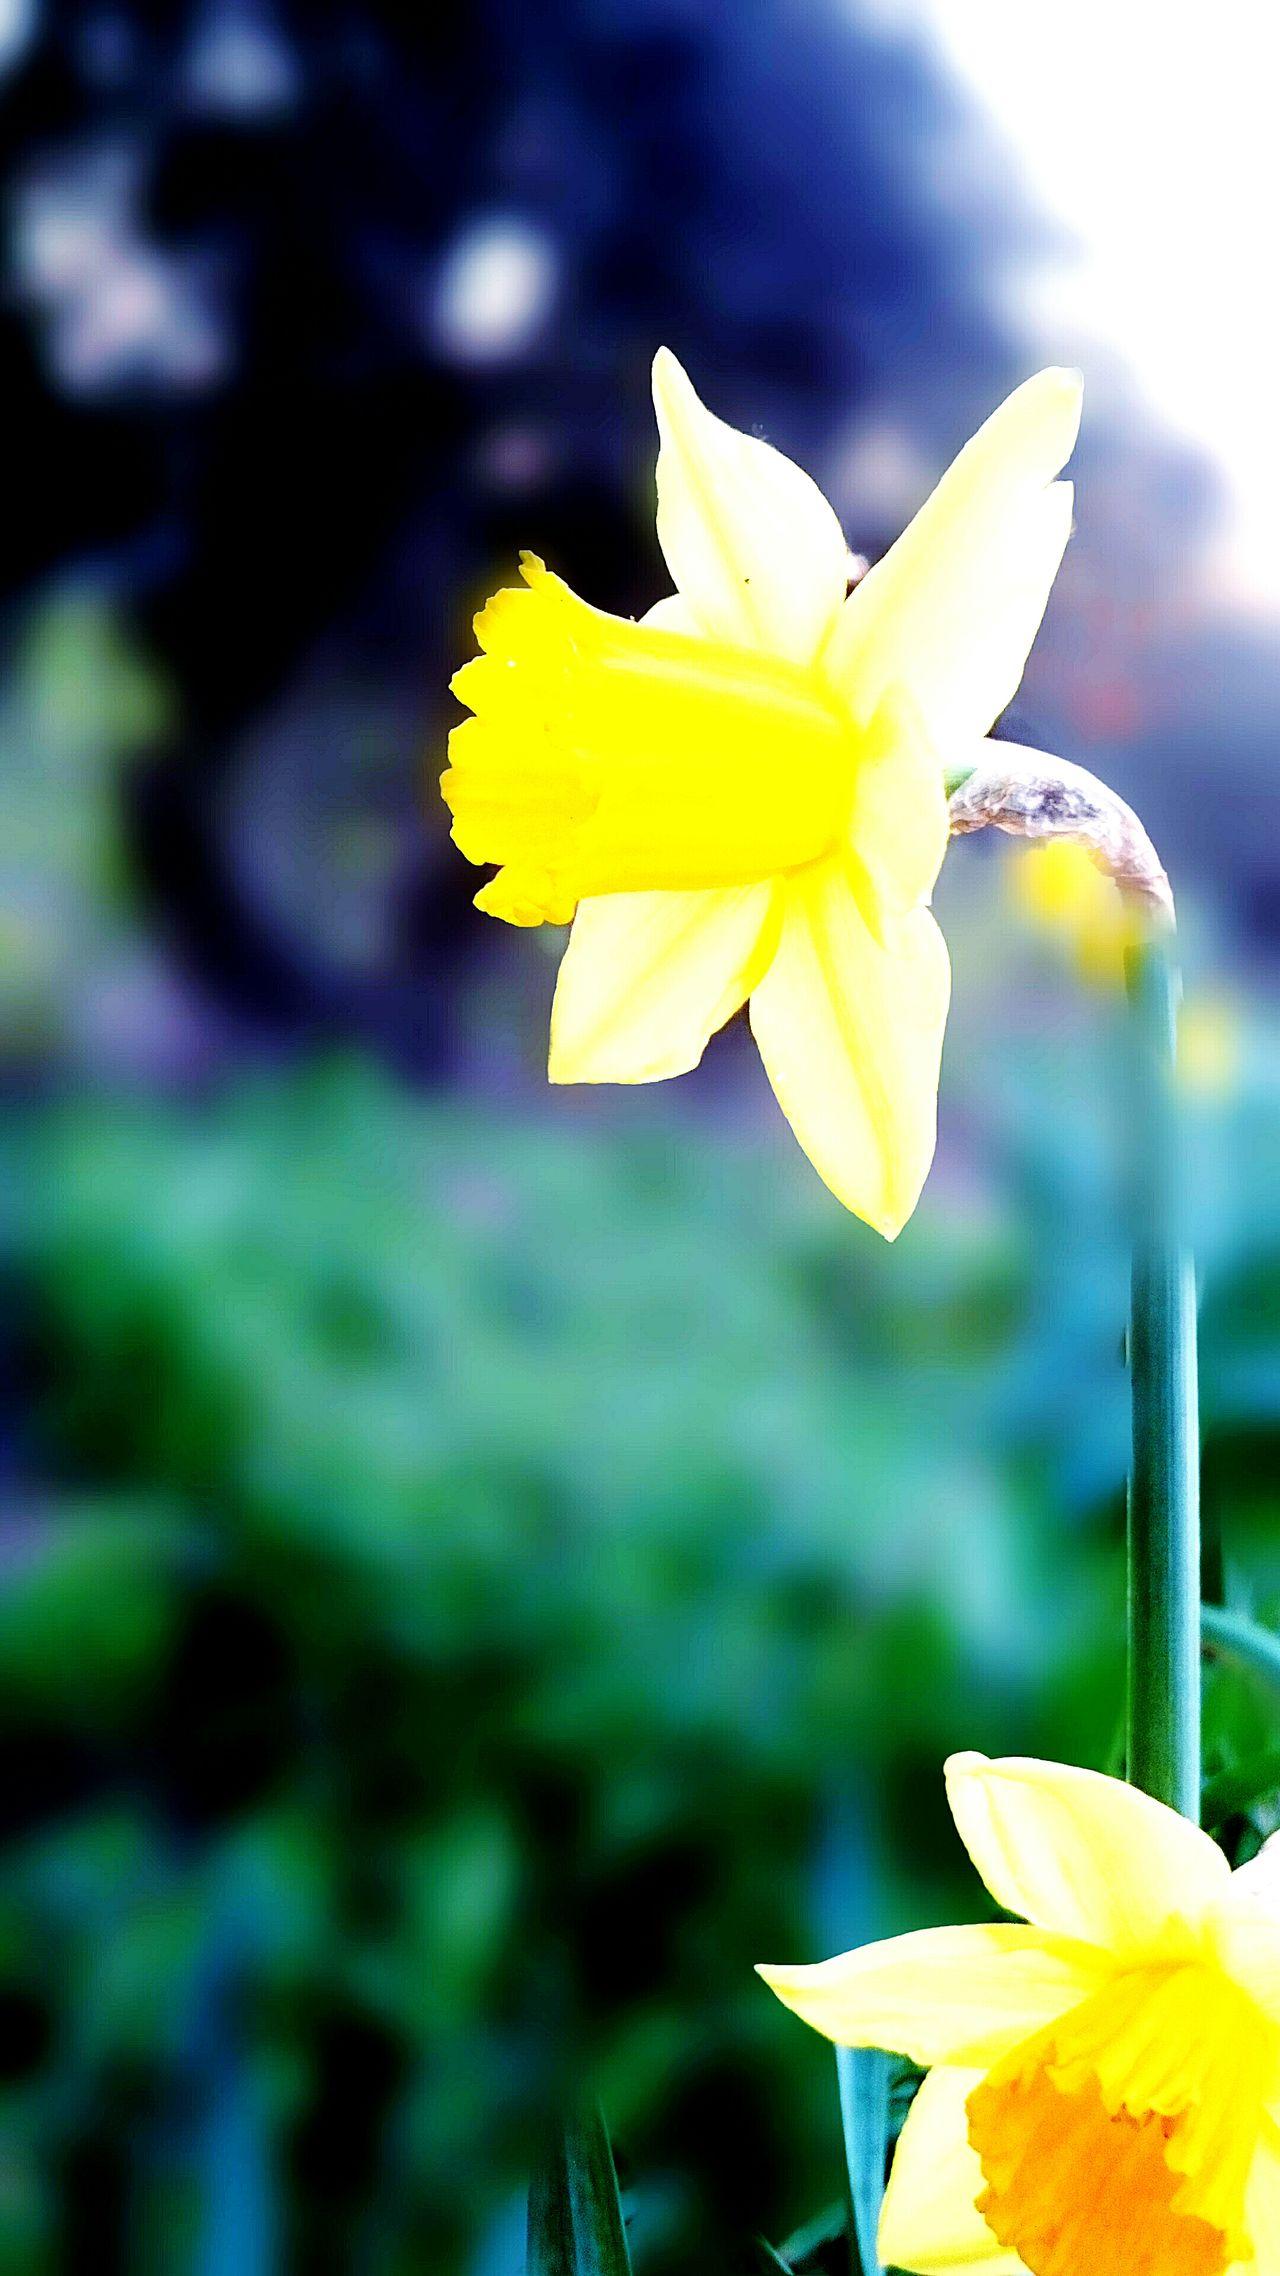 Flower Bure Blurbackground Yellow